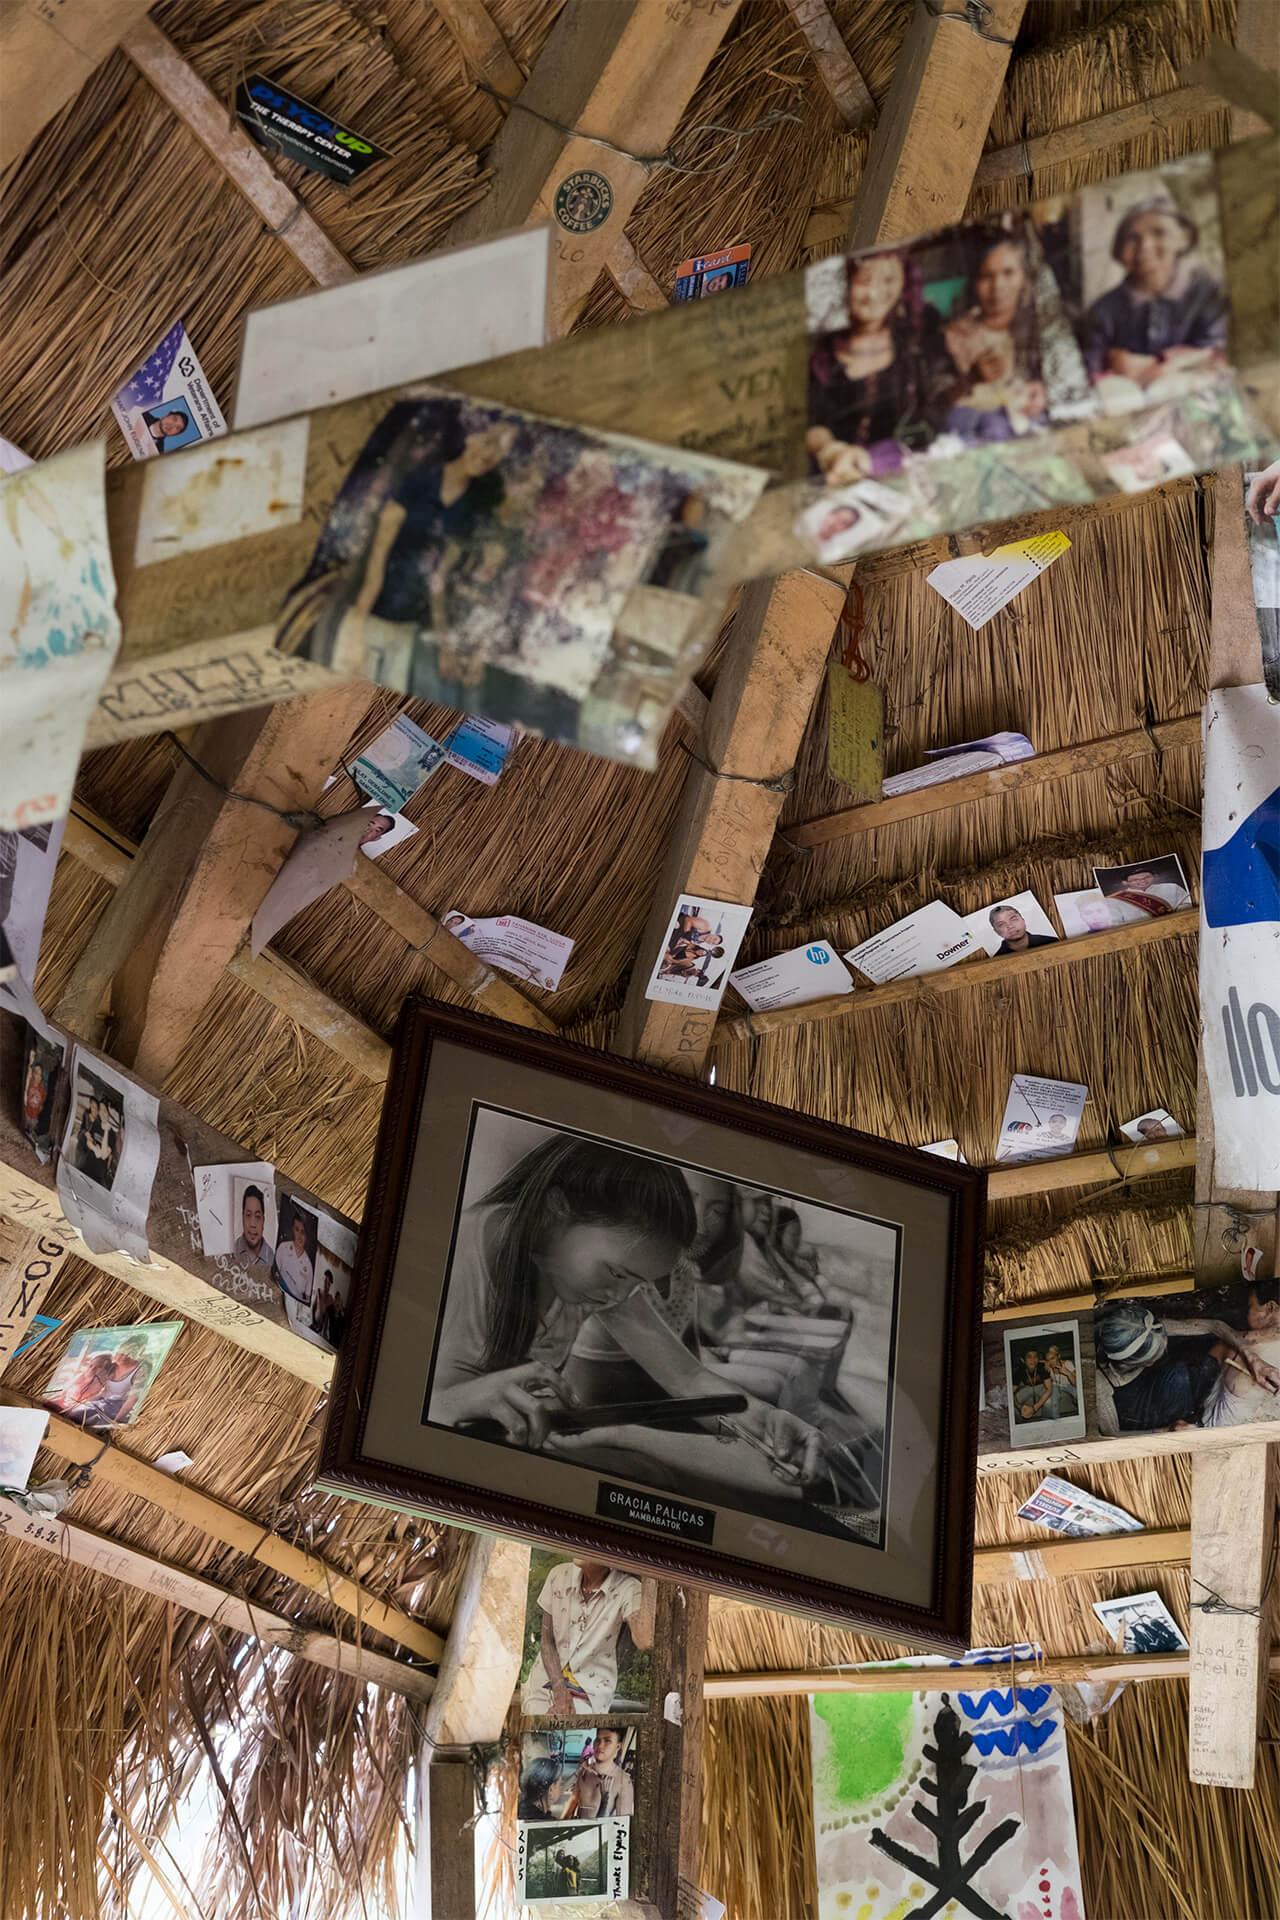 Photos of customers displayed around their hut